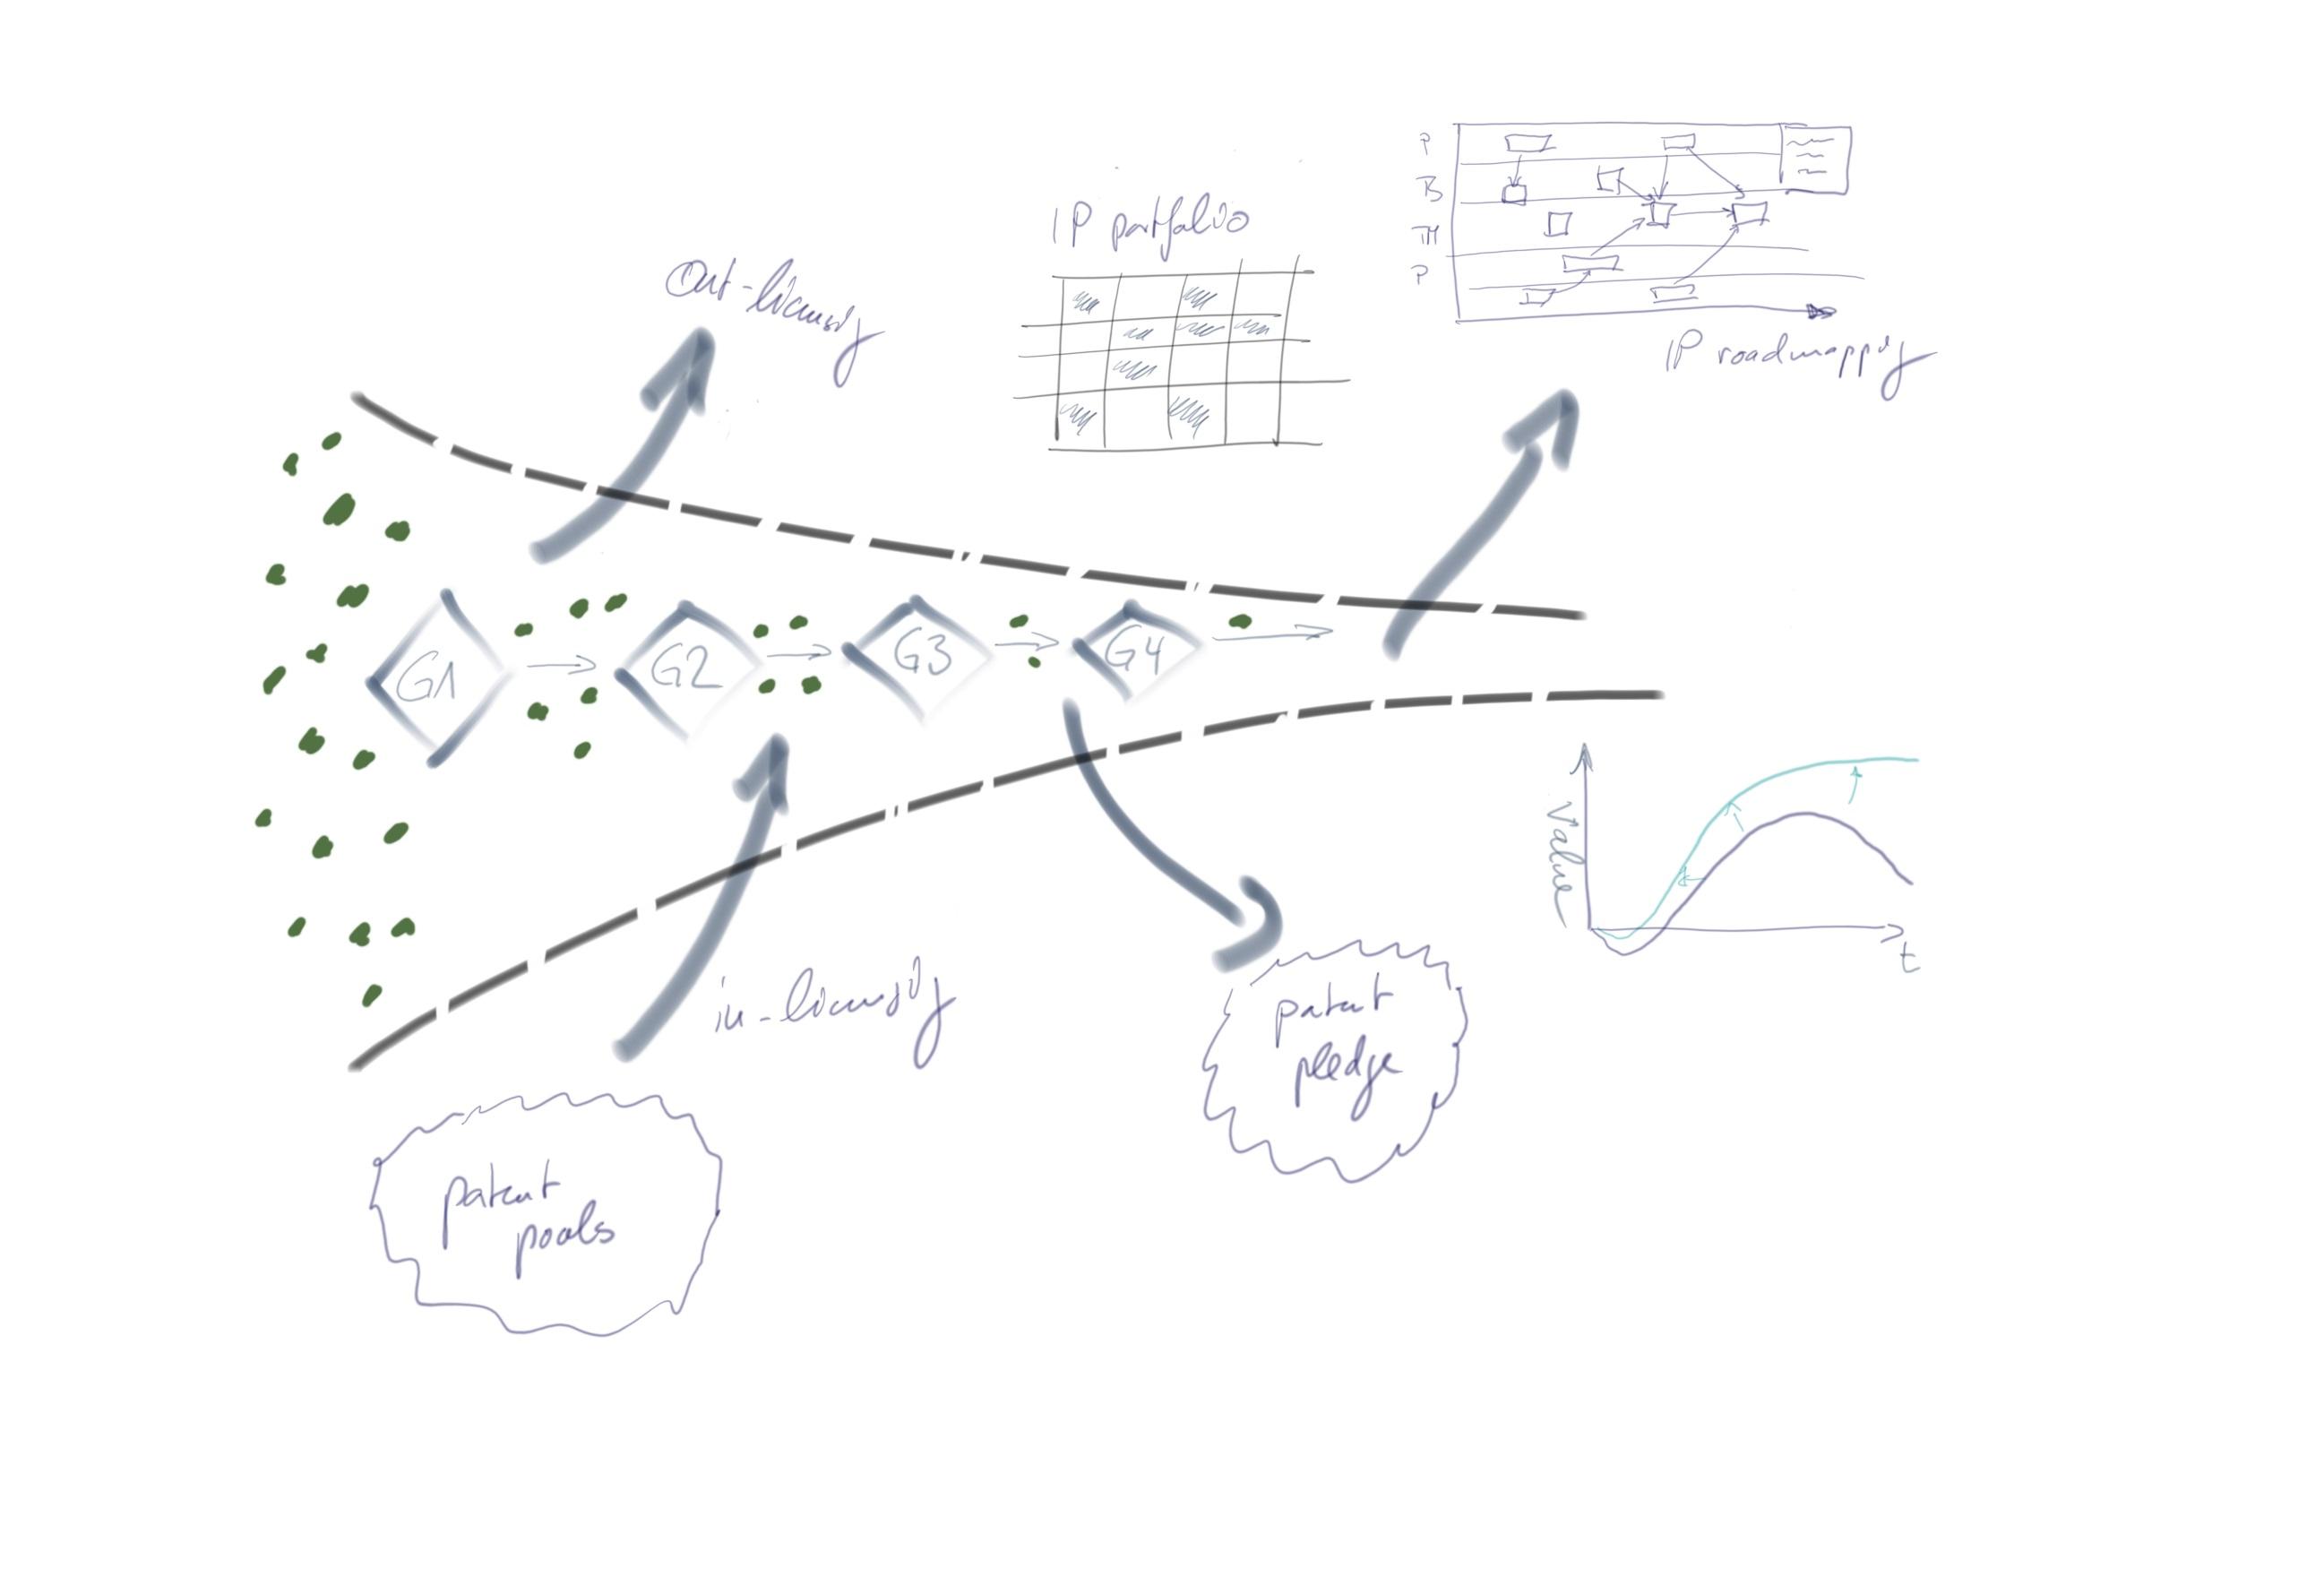 Strategic IP and innovation management